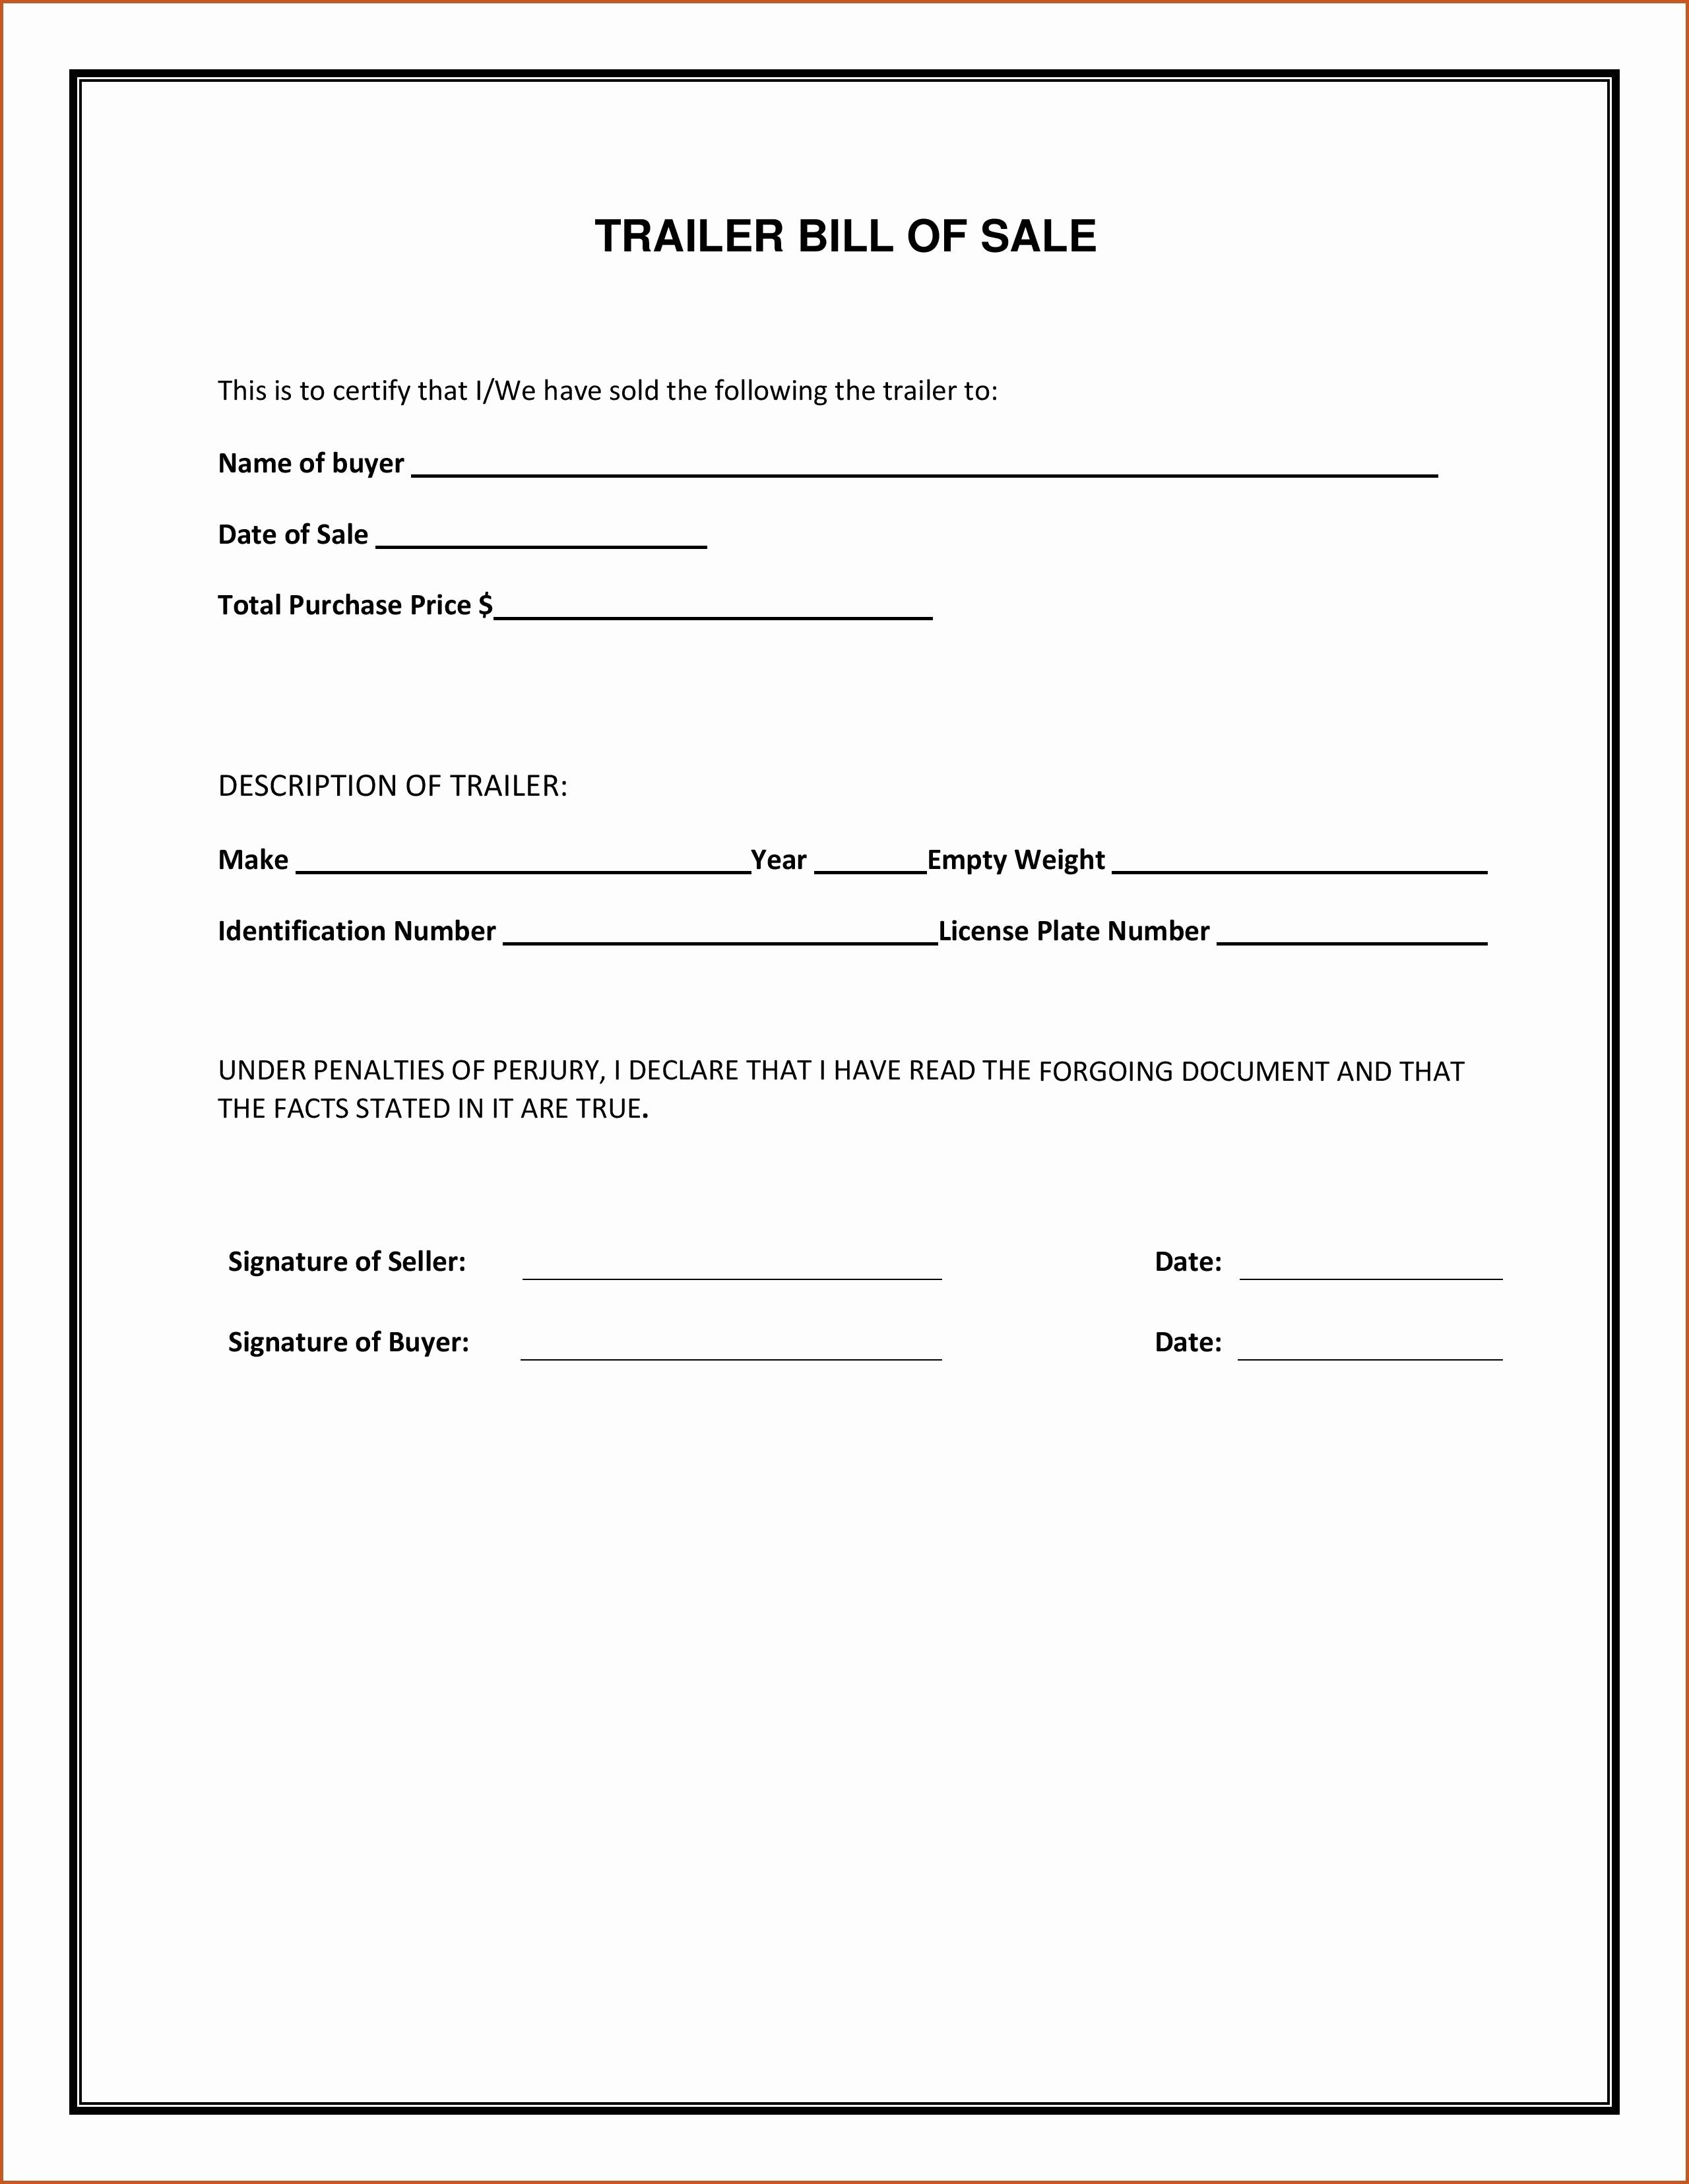 Sample Auto Bill Of Sale – Emeline.space - Free Printable Automobile Bill Of Sale Template